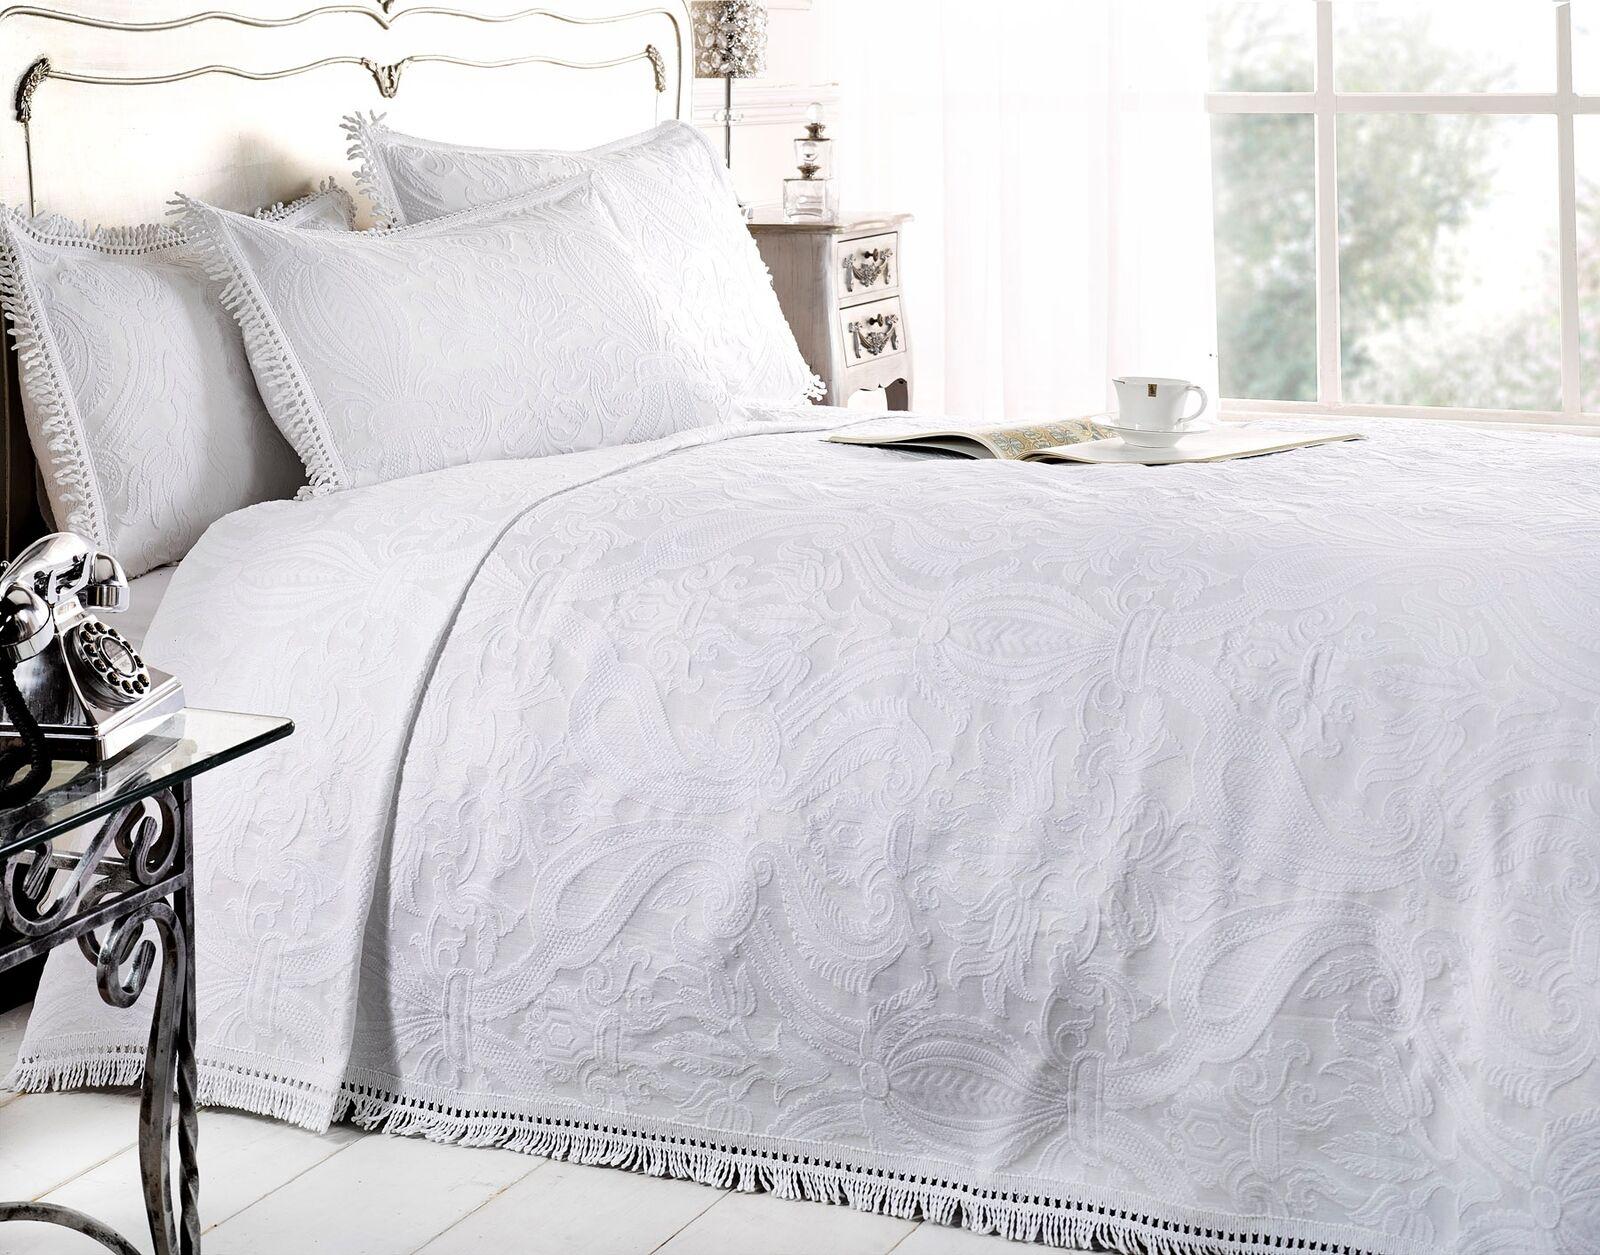 New Mafalda Weiß Bedspread Portuguese Style Sofa Bed Throw Mix Cotton